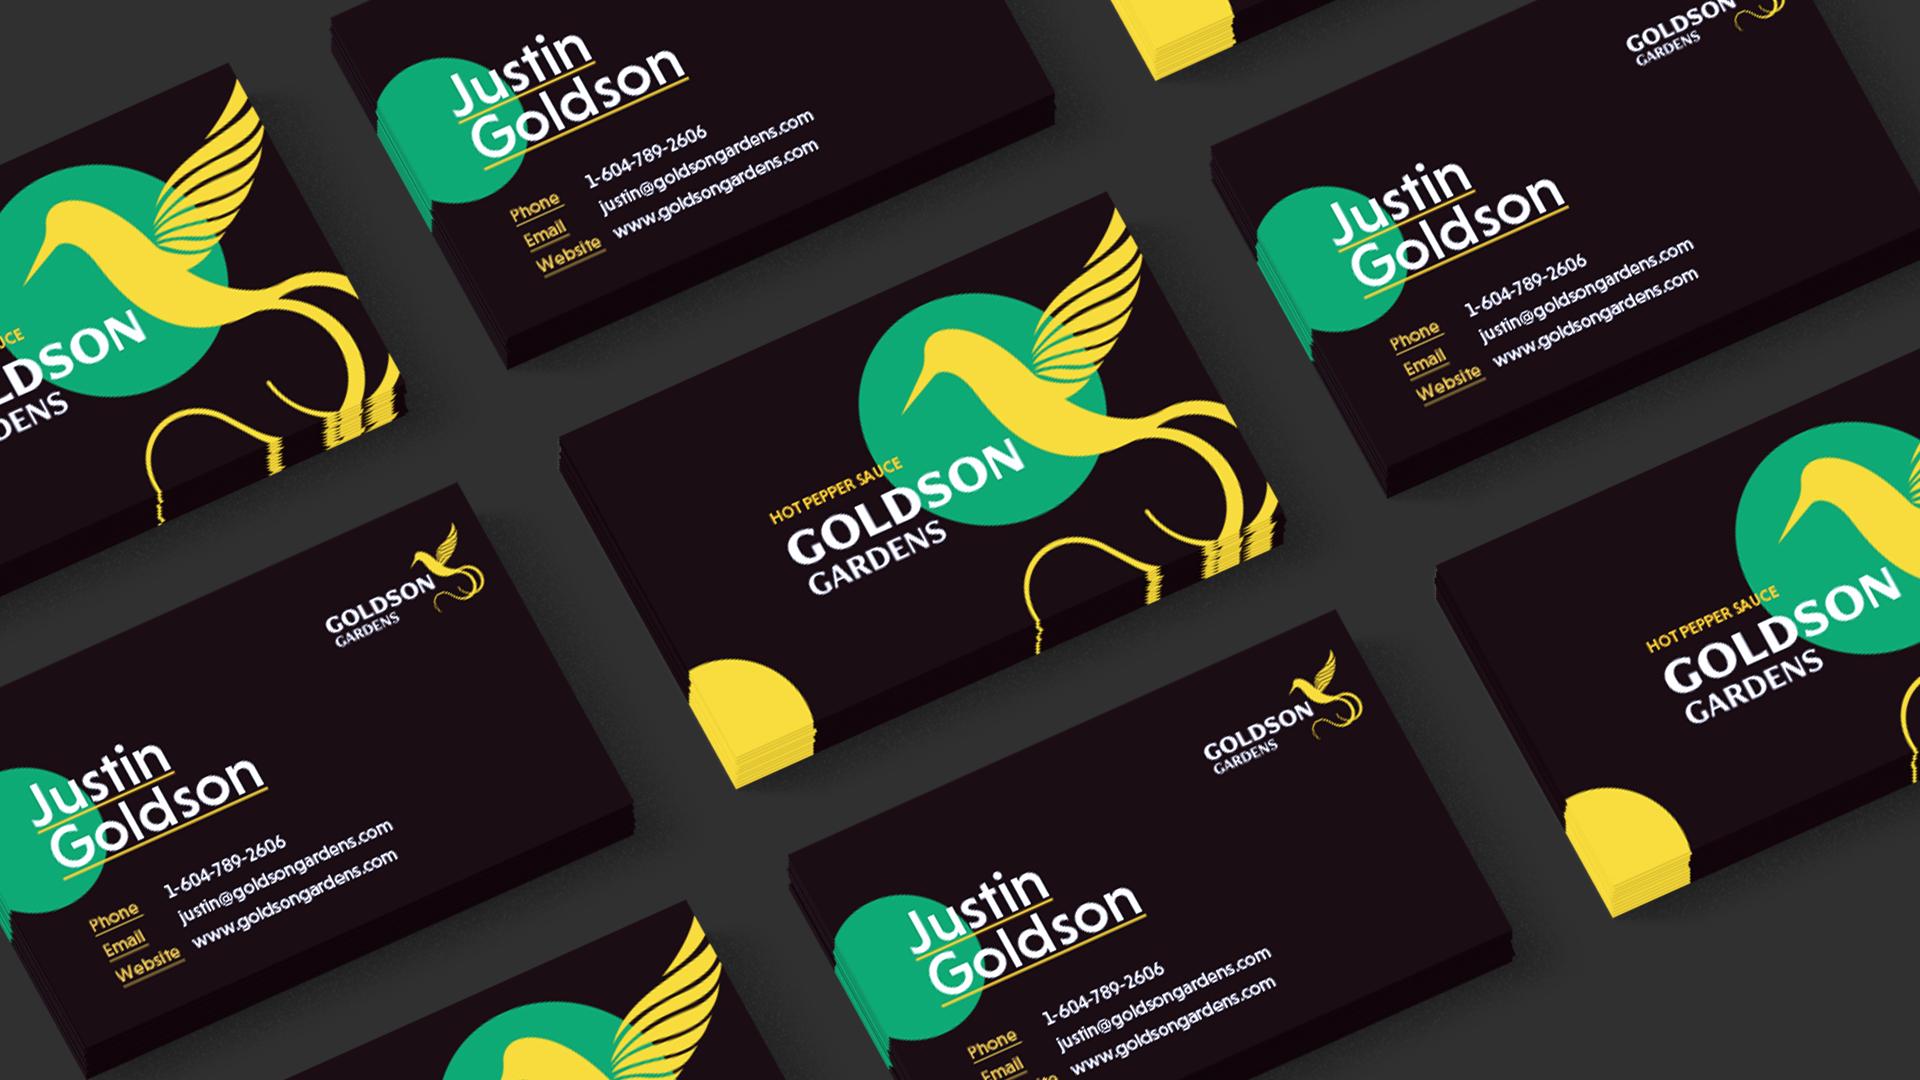 Goldson Gardens Branded Assets